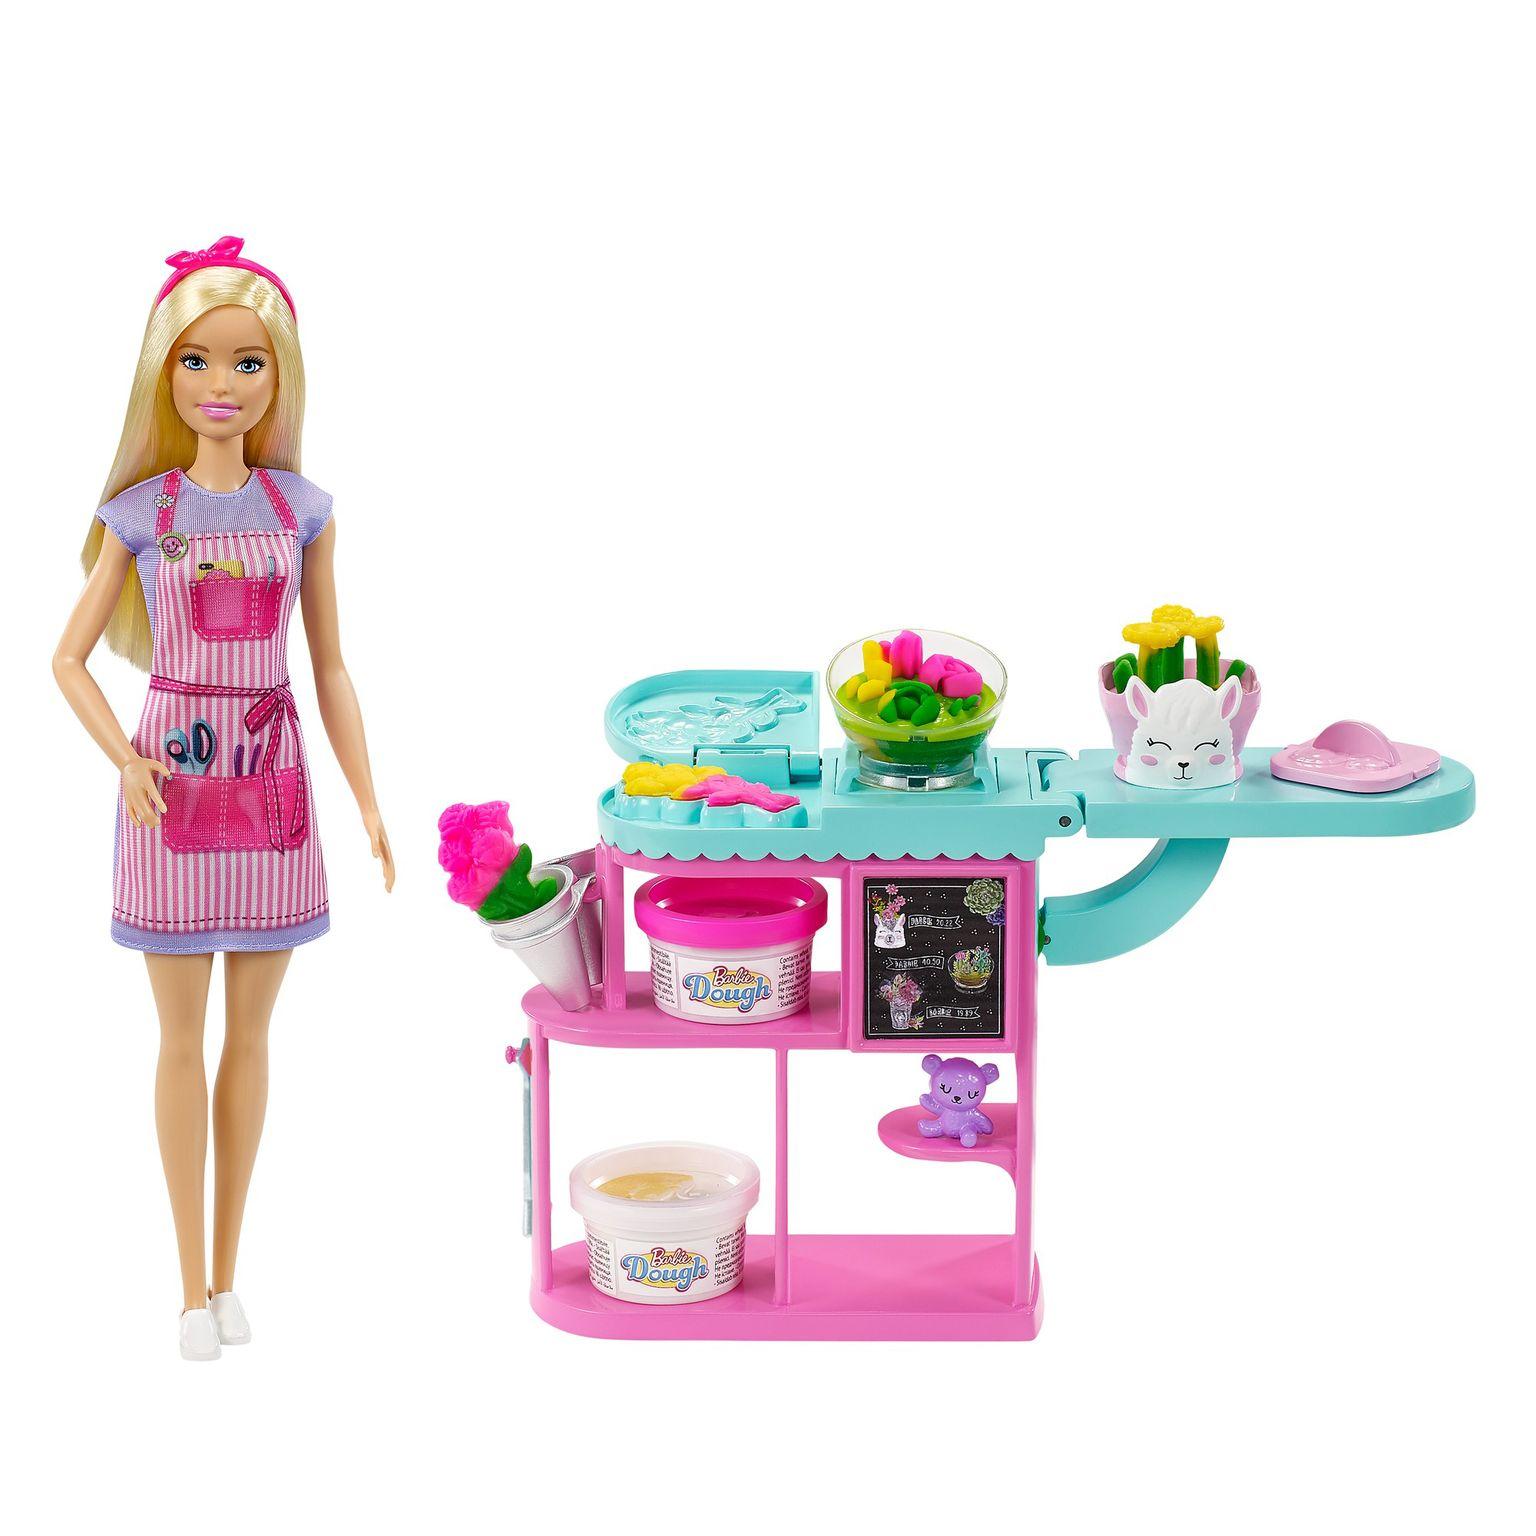 Barbie blomsterhandler